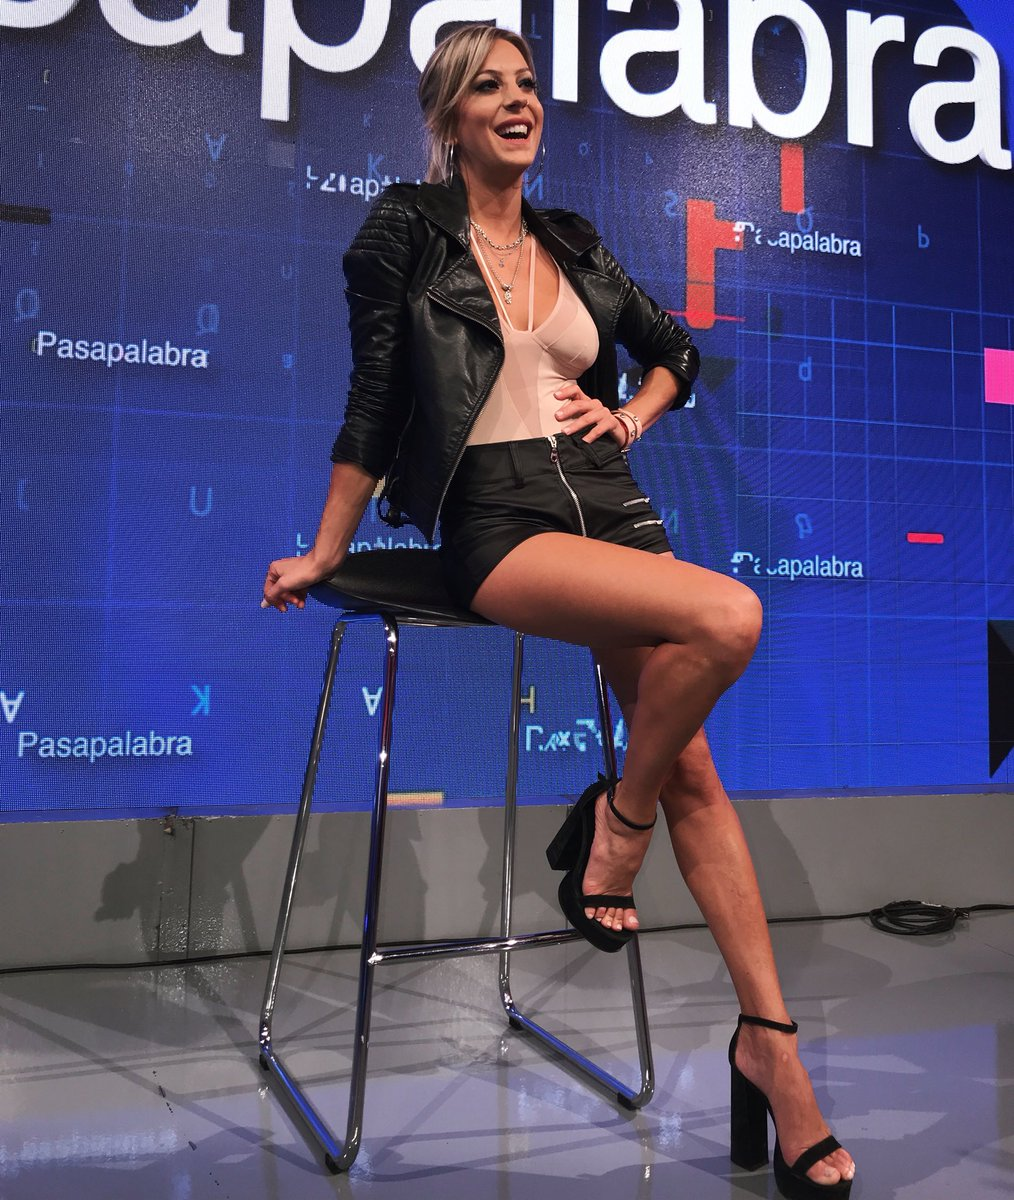 Snapchat Noelia Marzol nudes (83 photos), Sexy, Bikini, Twitter, cameltoe 2018